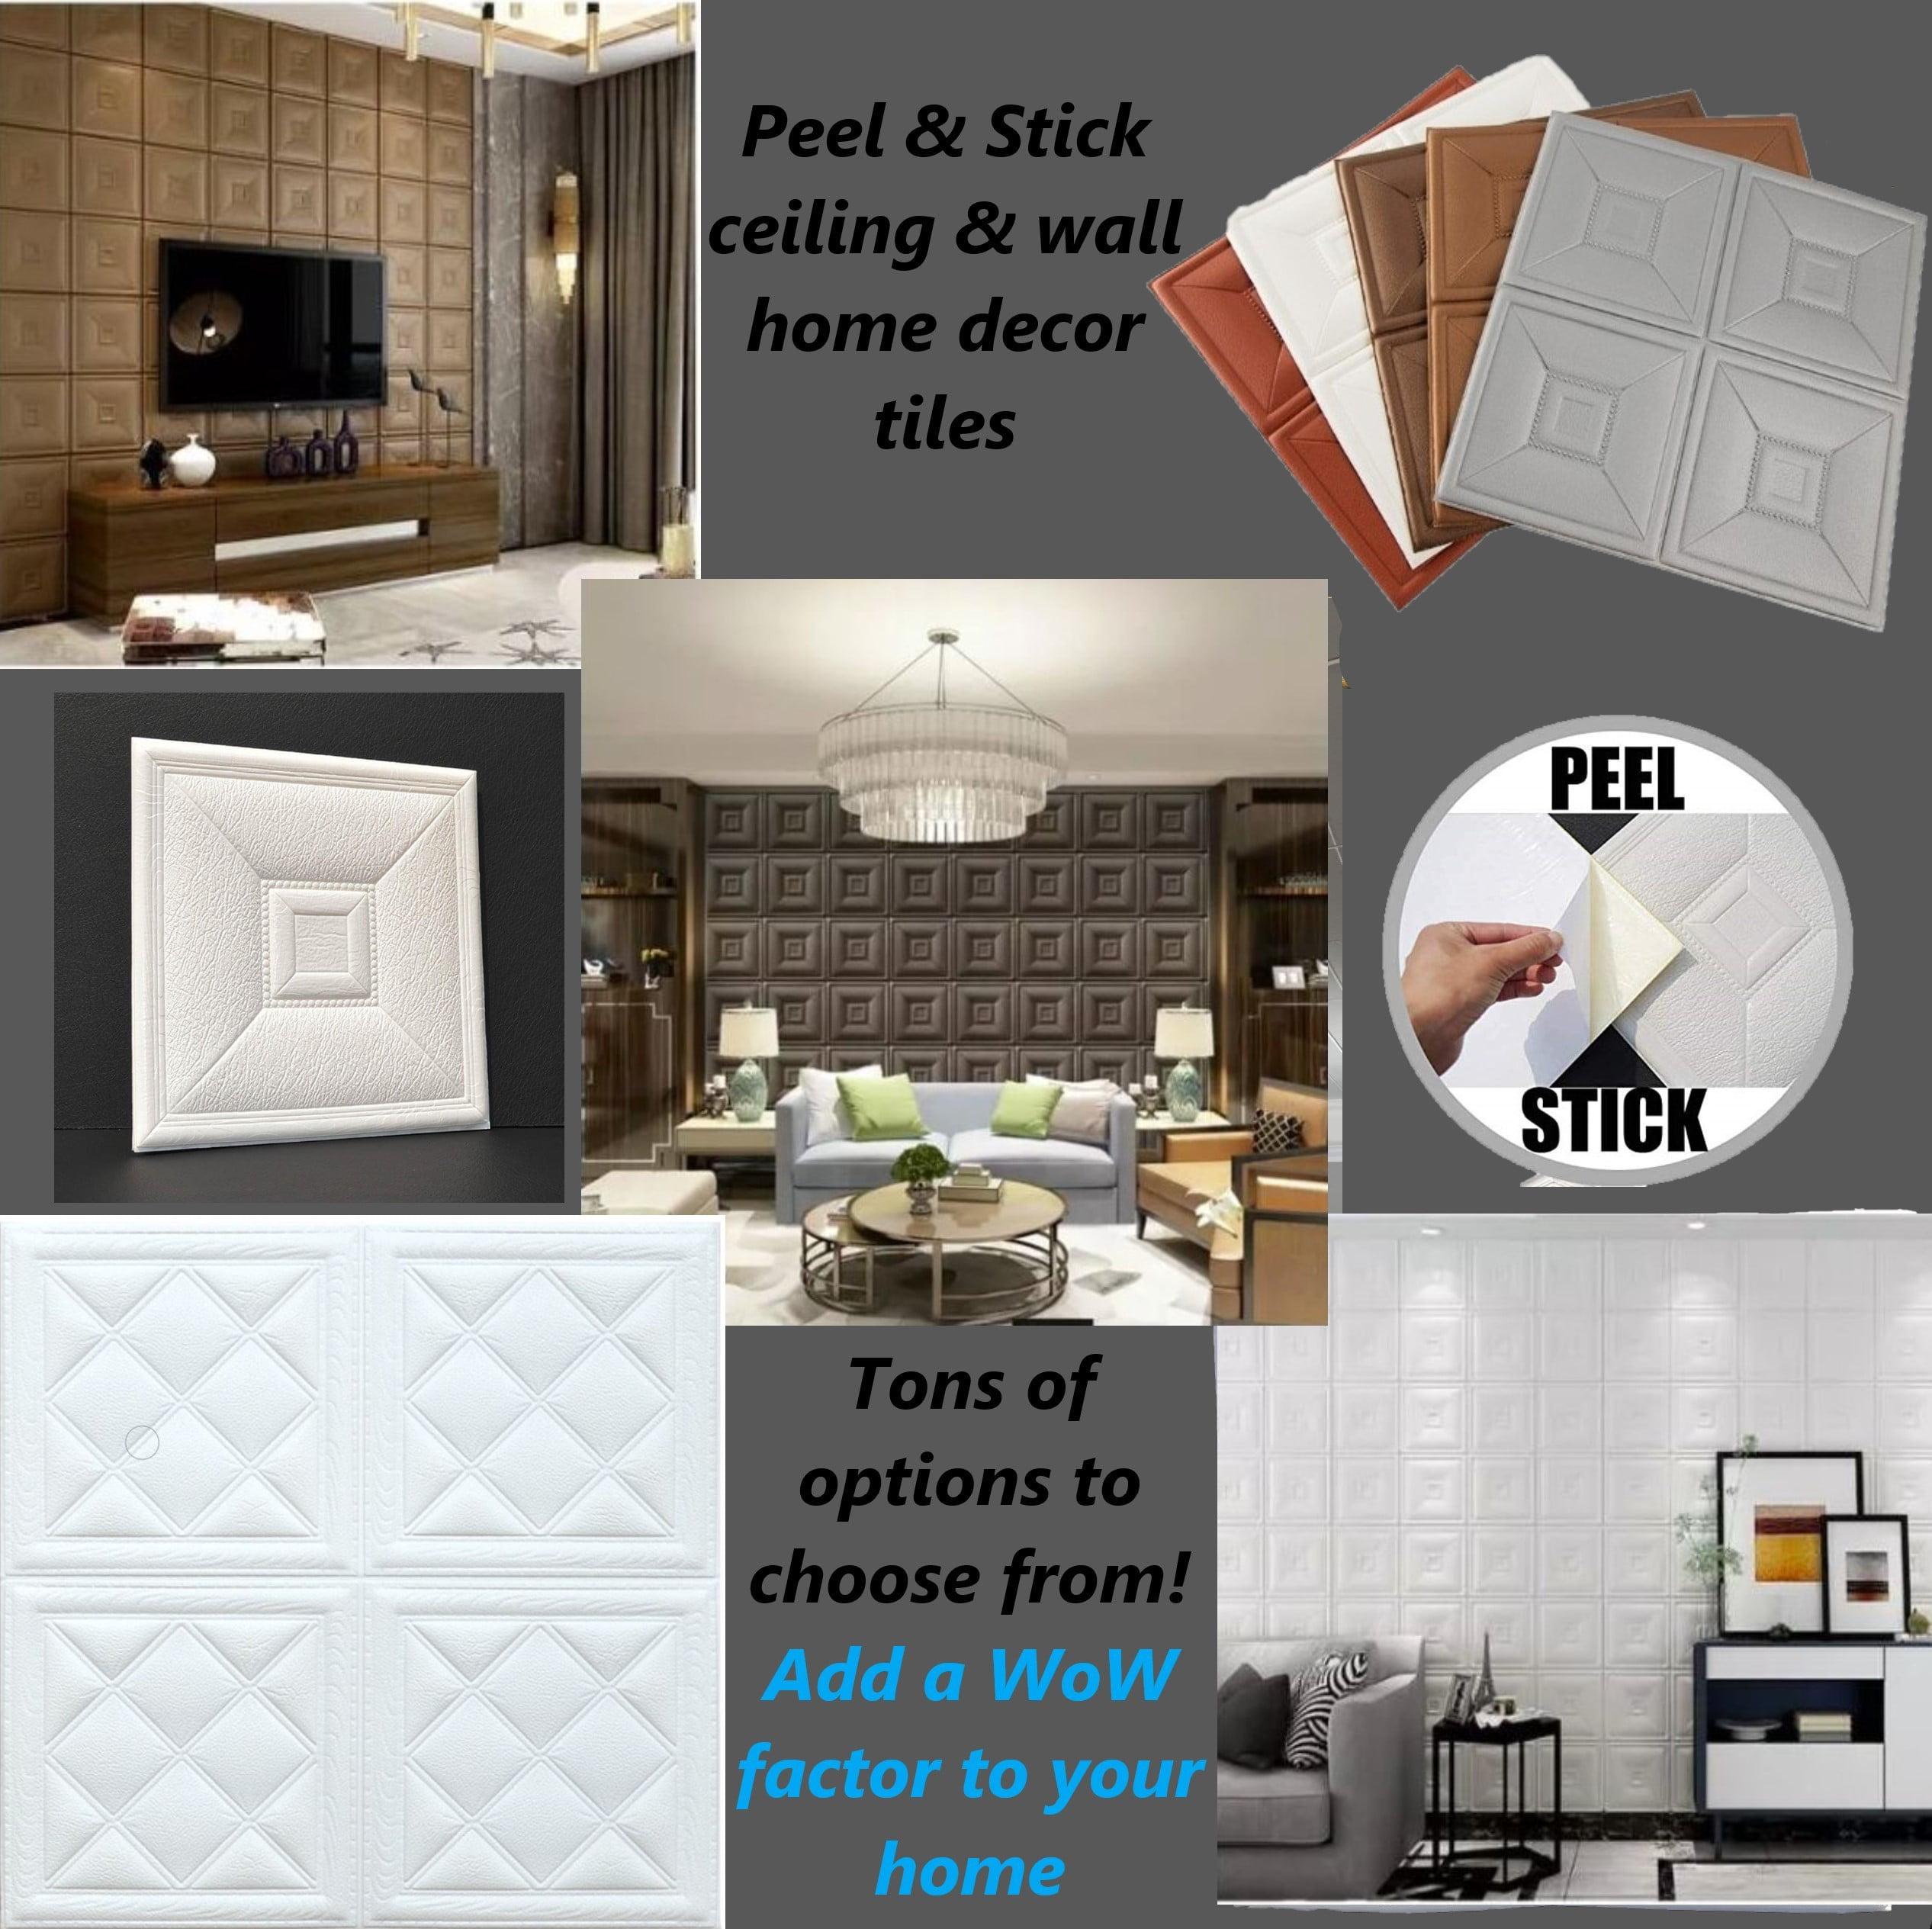 Self Adhesive Wood Look Wall Panels Faux Wood Wall Panels 3d Wood Wallpaper Peel And Stick